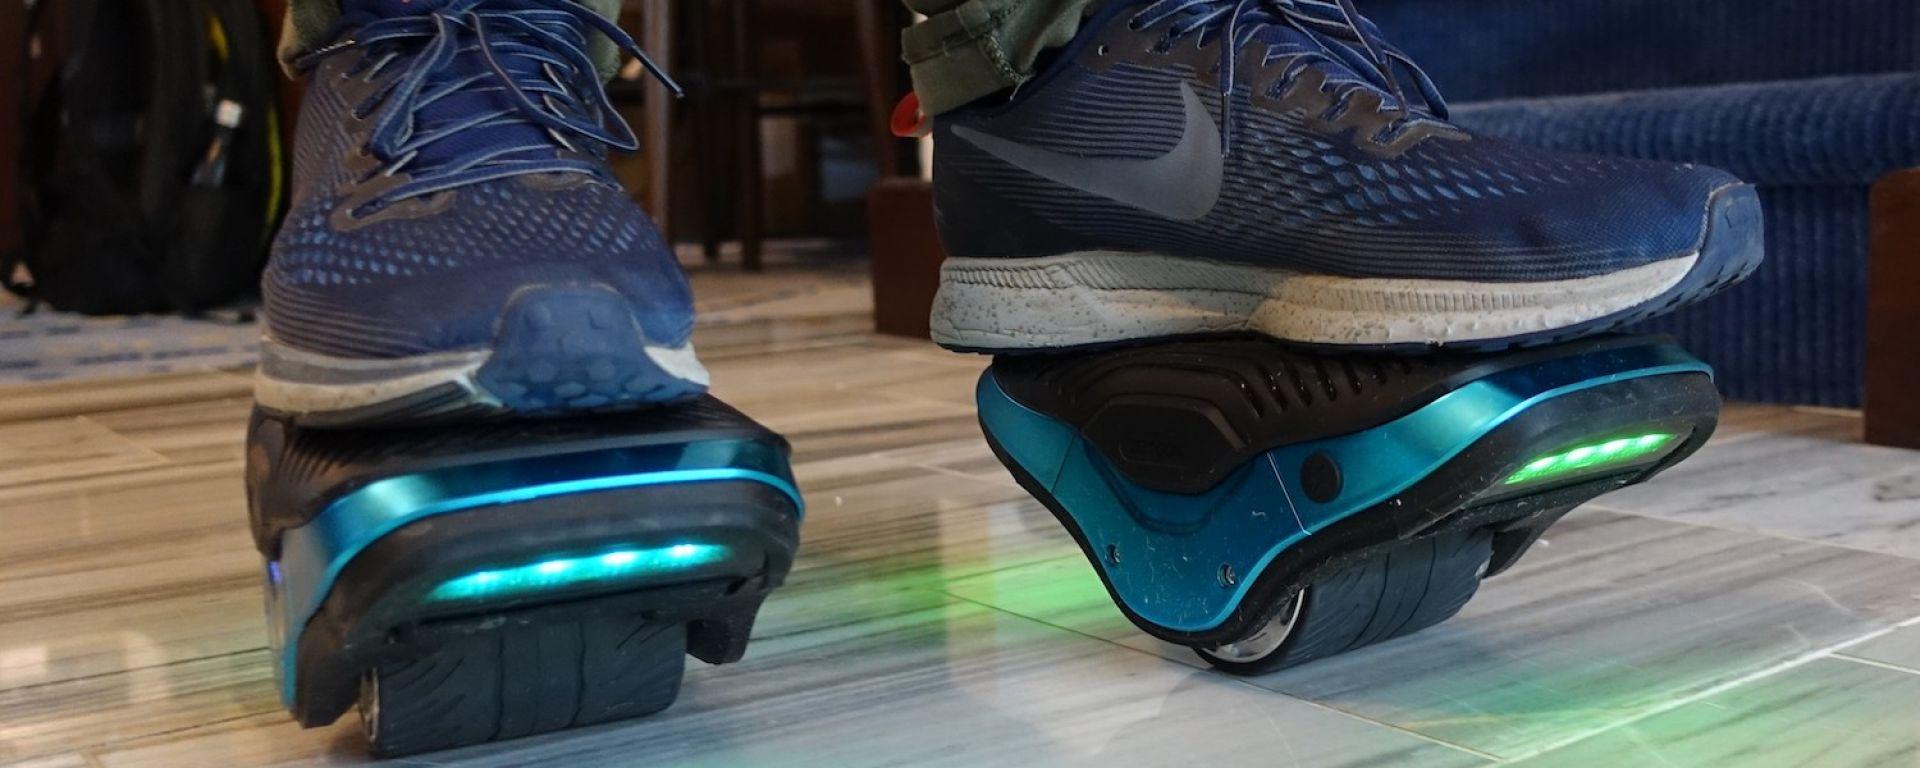 "Jetson Motokicks: al CES 2019 le scarpe ""a guida autonoma"""